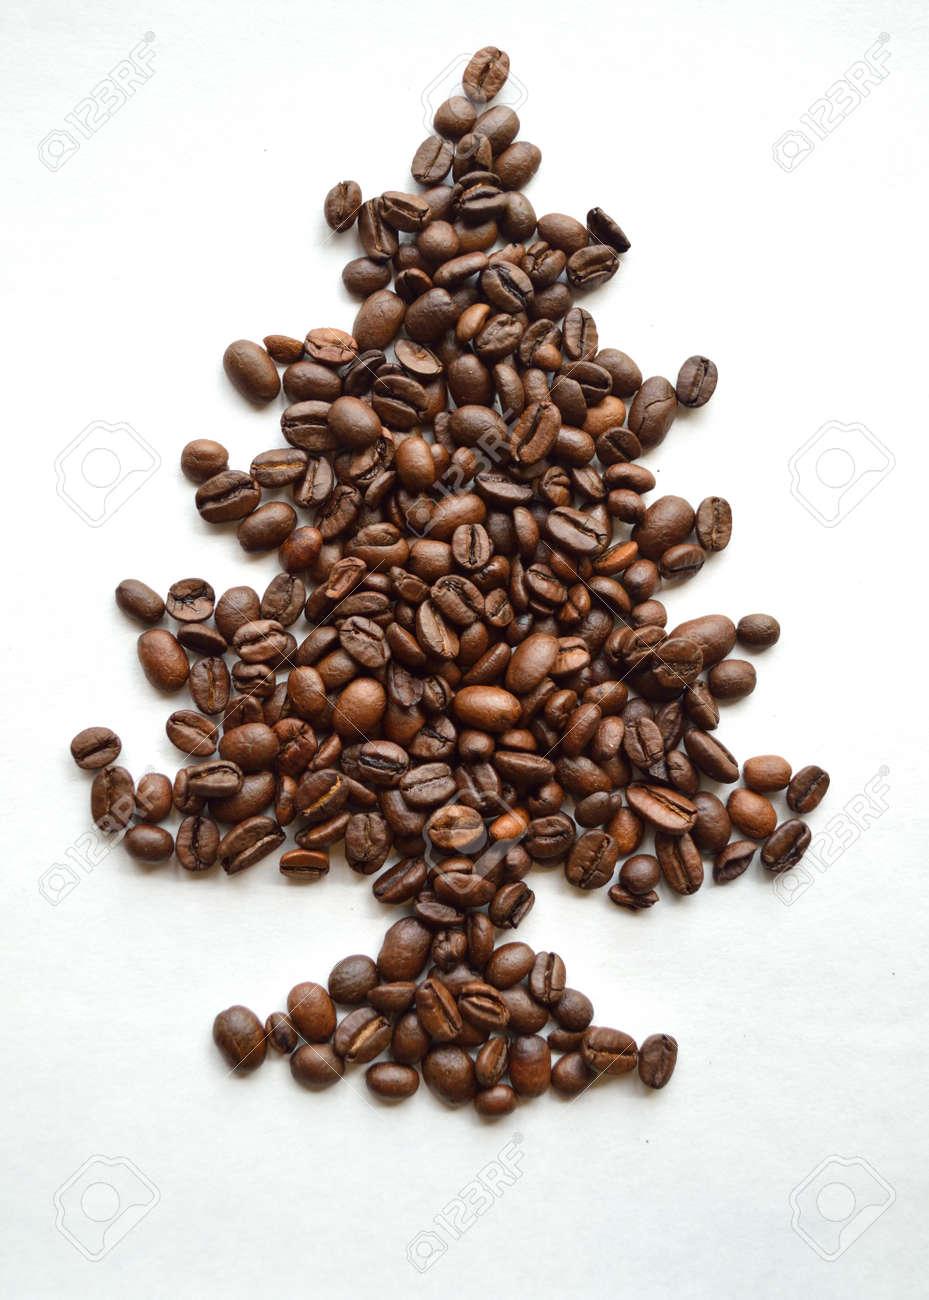 Coffee Christmas Tree.Dark Roasted Coffee Beans Arranged Into A Christmas Tree Shape